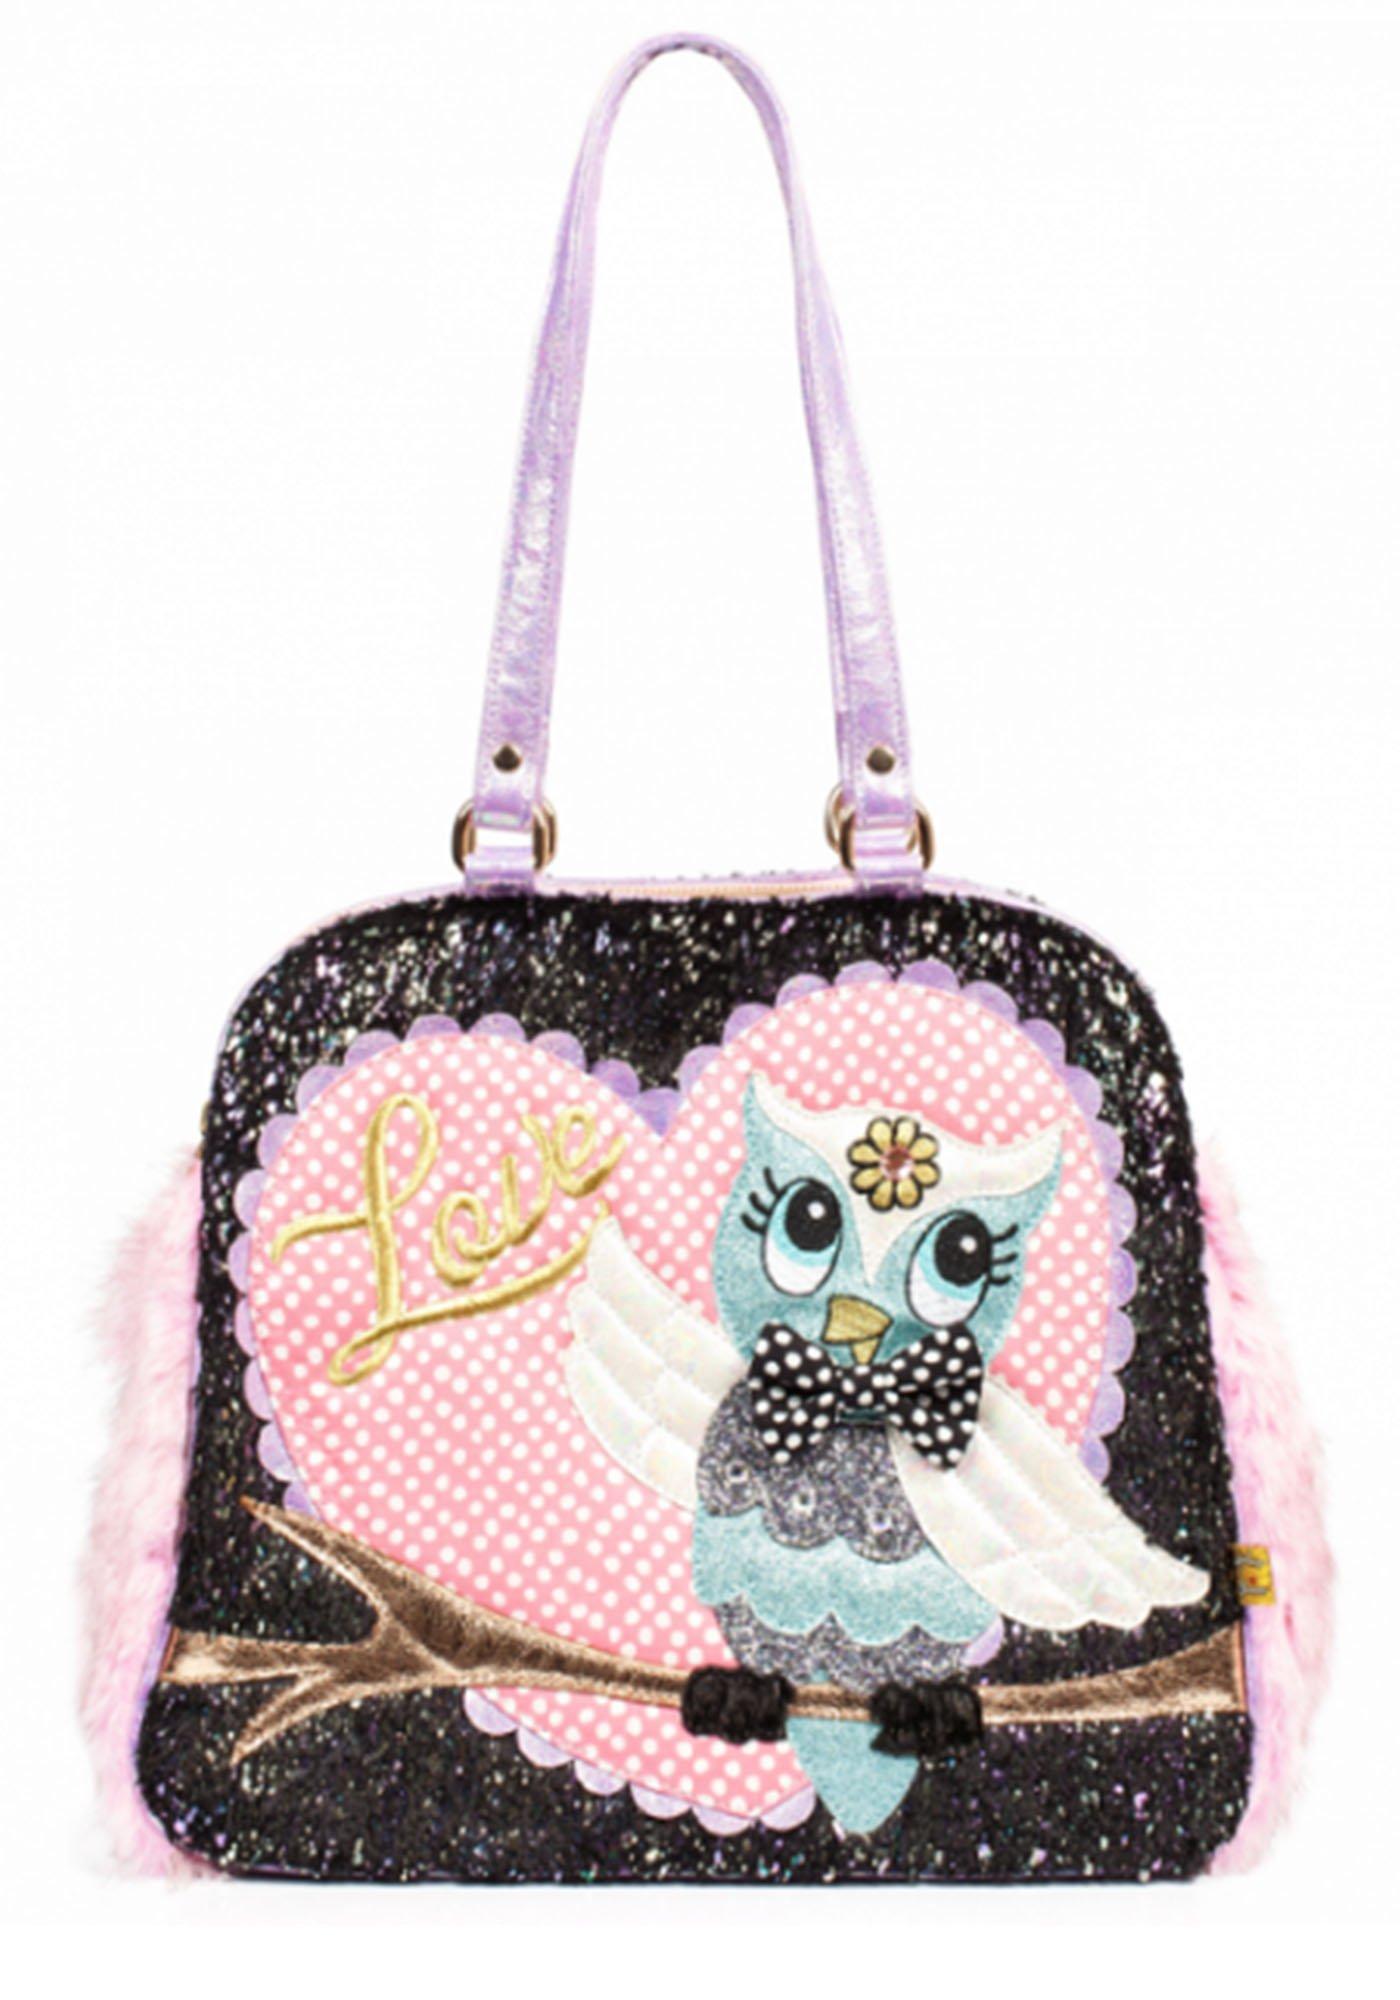 Irregular Choice What A Hoot Owl Love Faux Fur Novelty Handbag (One Size, Black & Pink)